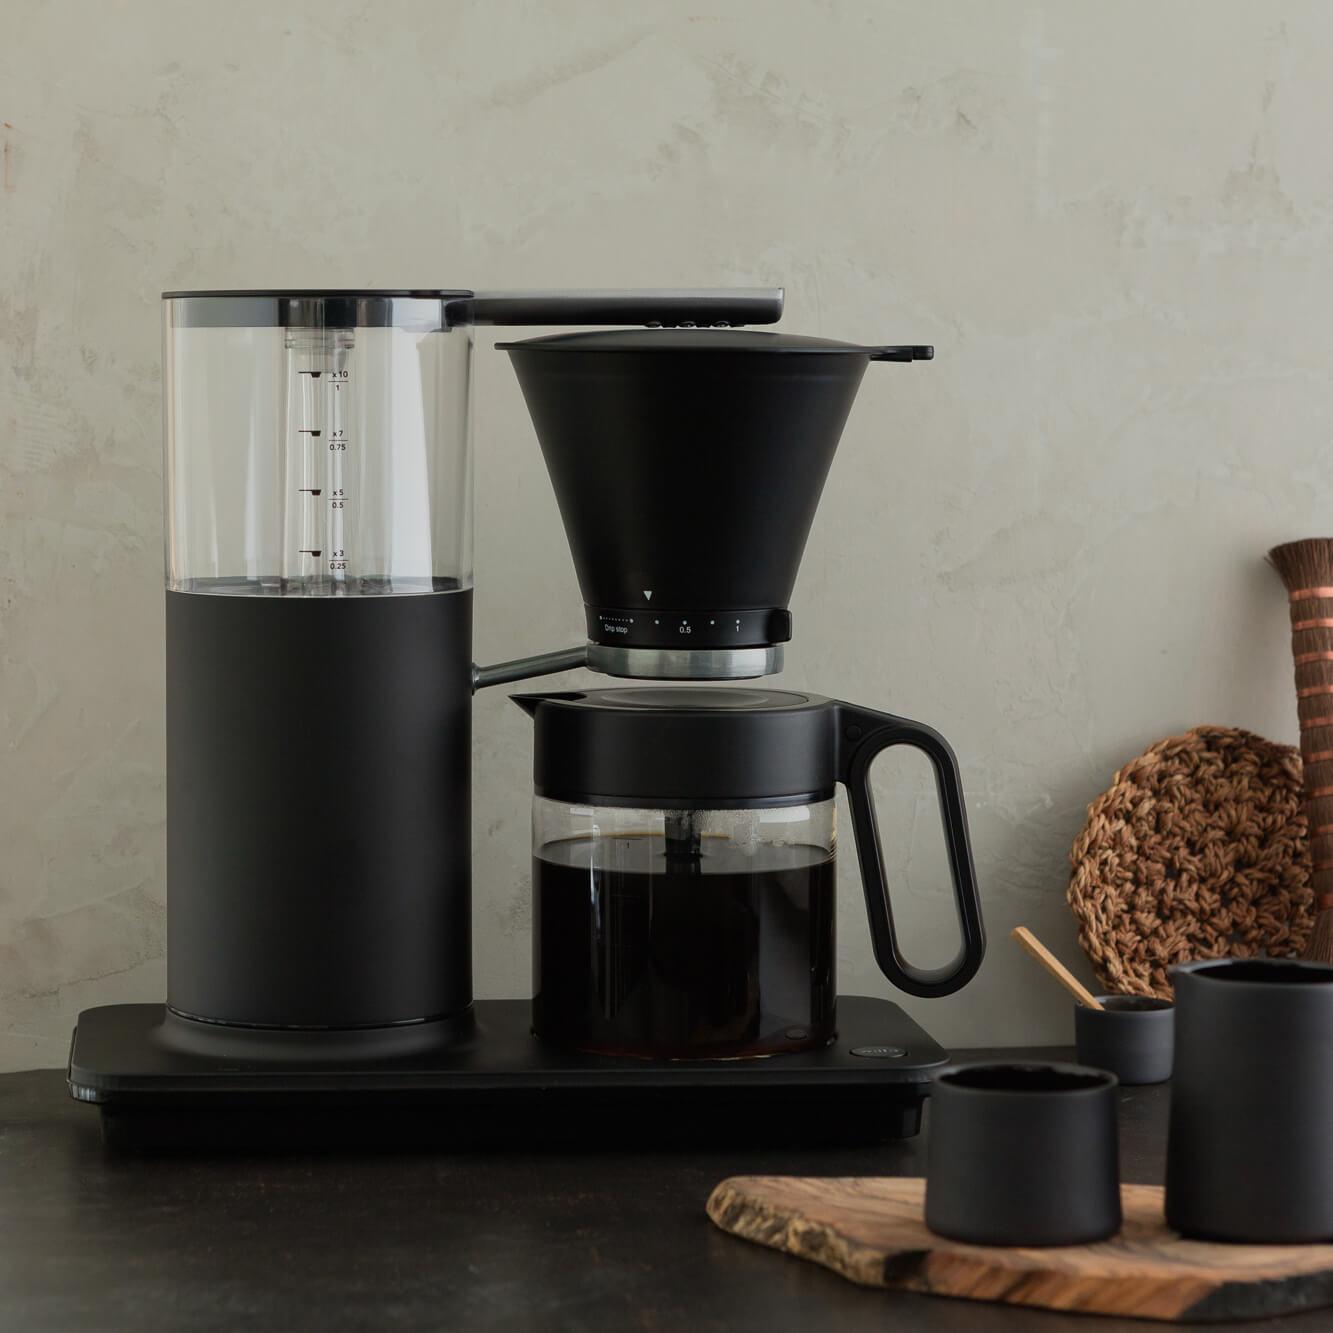 Wilfa Filterkaffeemaschine CLASSIC Plus Matt Schwarz